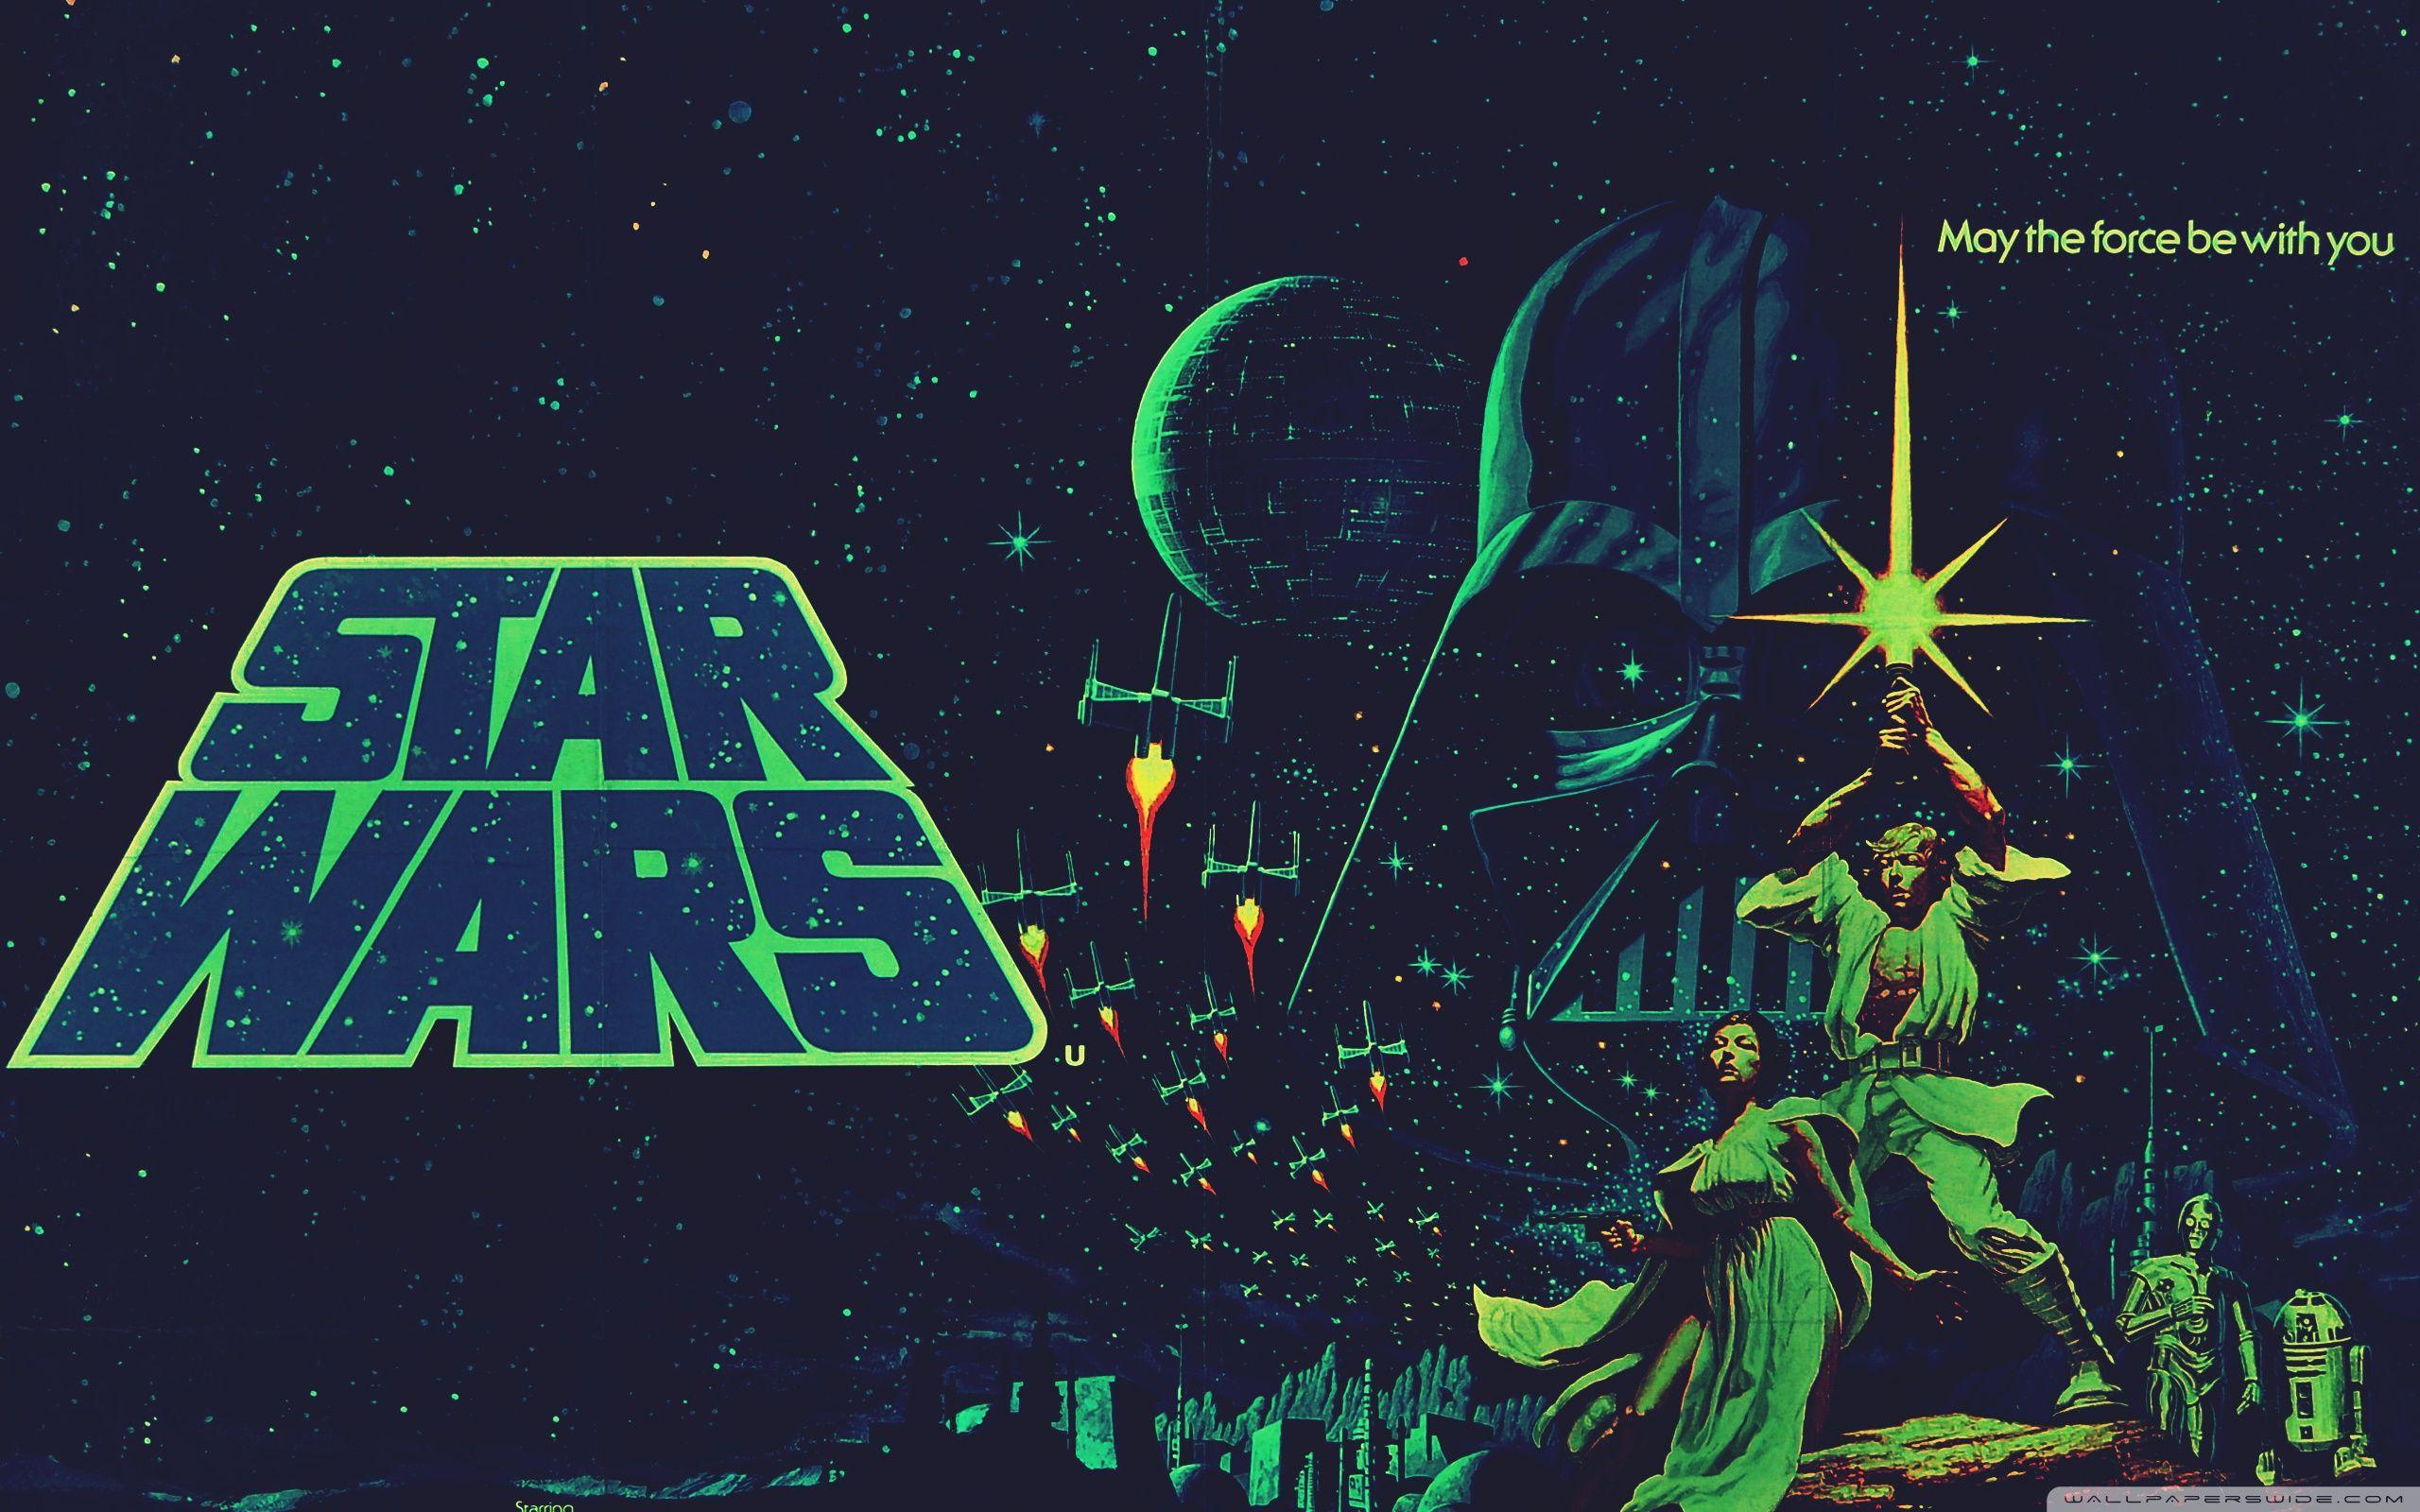 Movie Star Wars Poster Hd Desktop Wallpaper High Definition Star